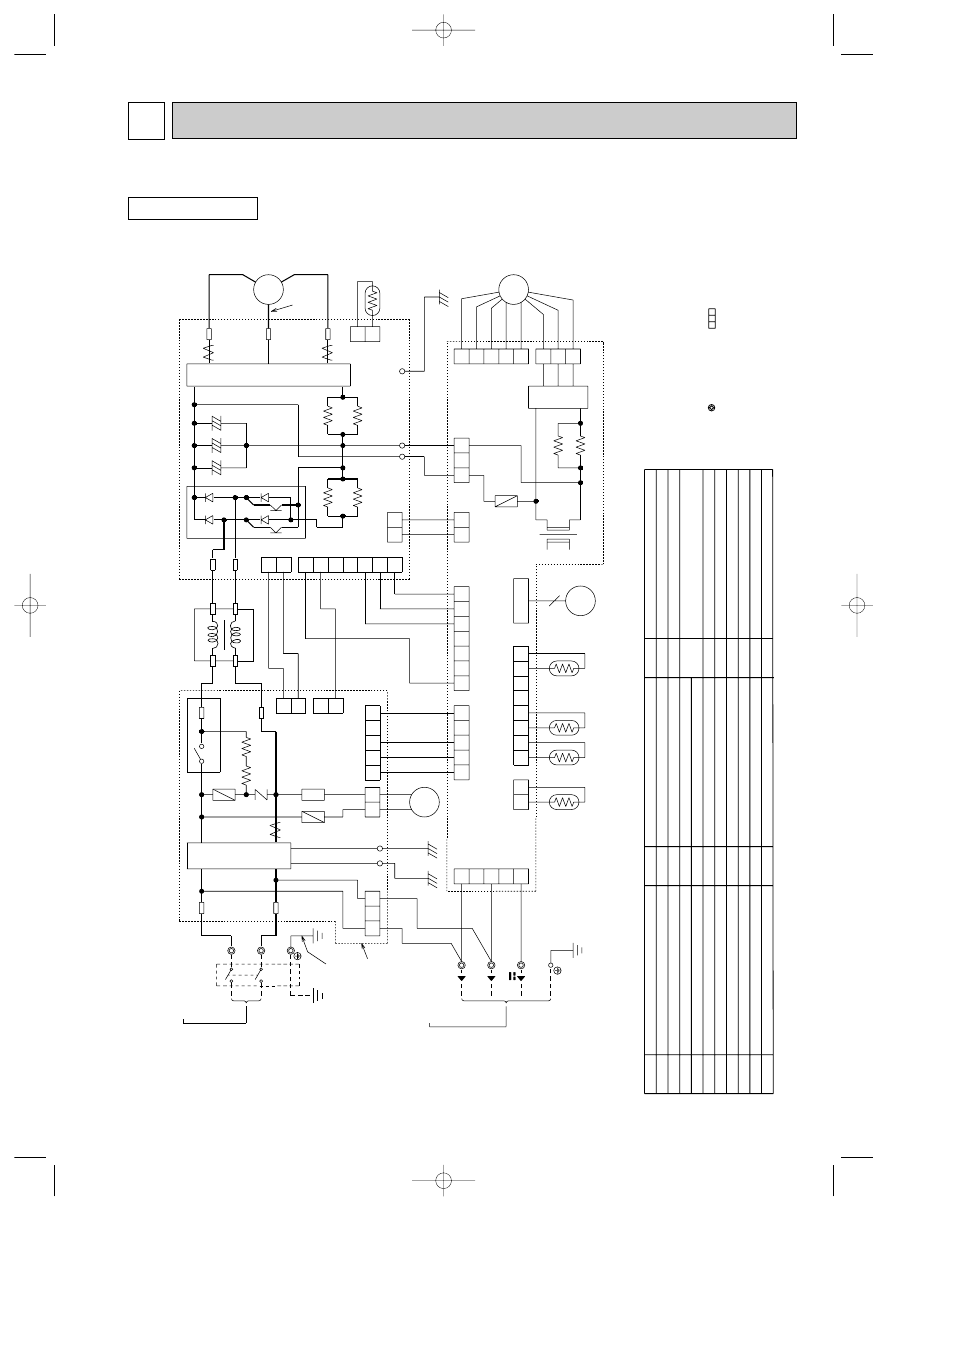 Mitsubishi Electric Wiring Diagram Electrical Diagrams 1986 6 Muz Gb50va 21s4 1995 Galant System